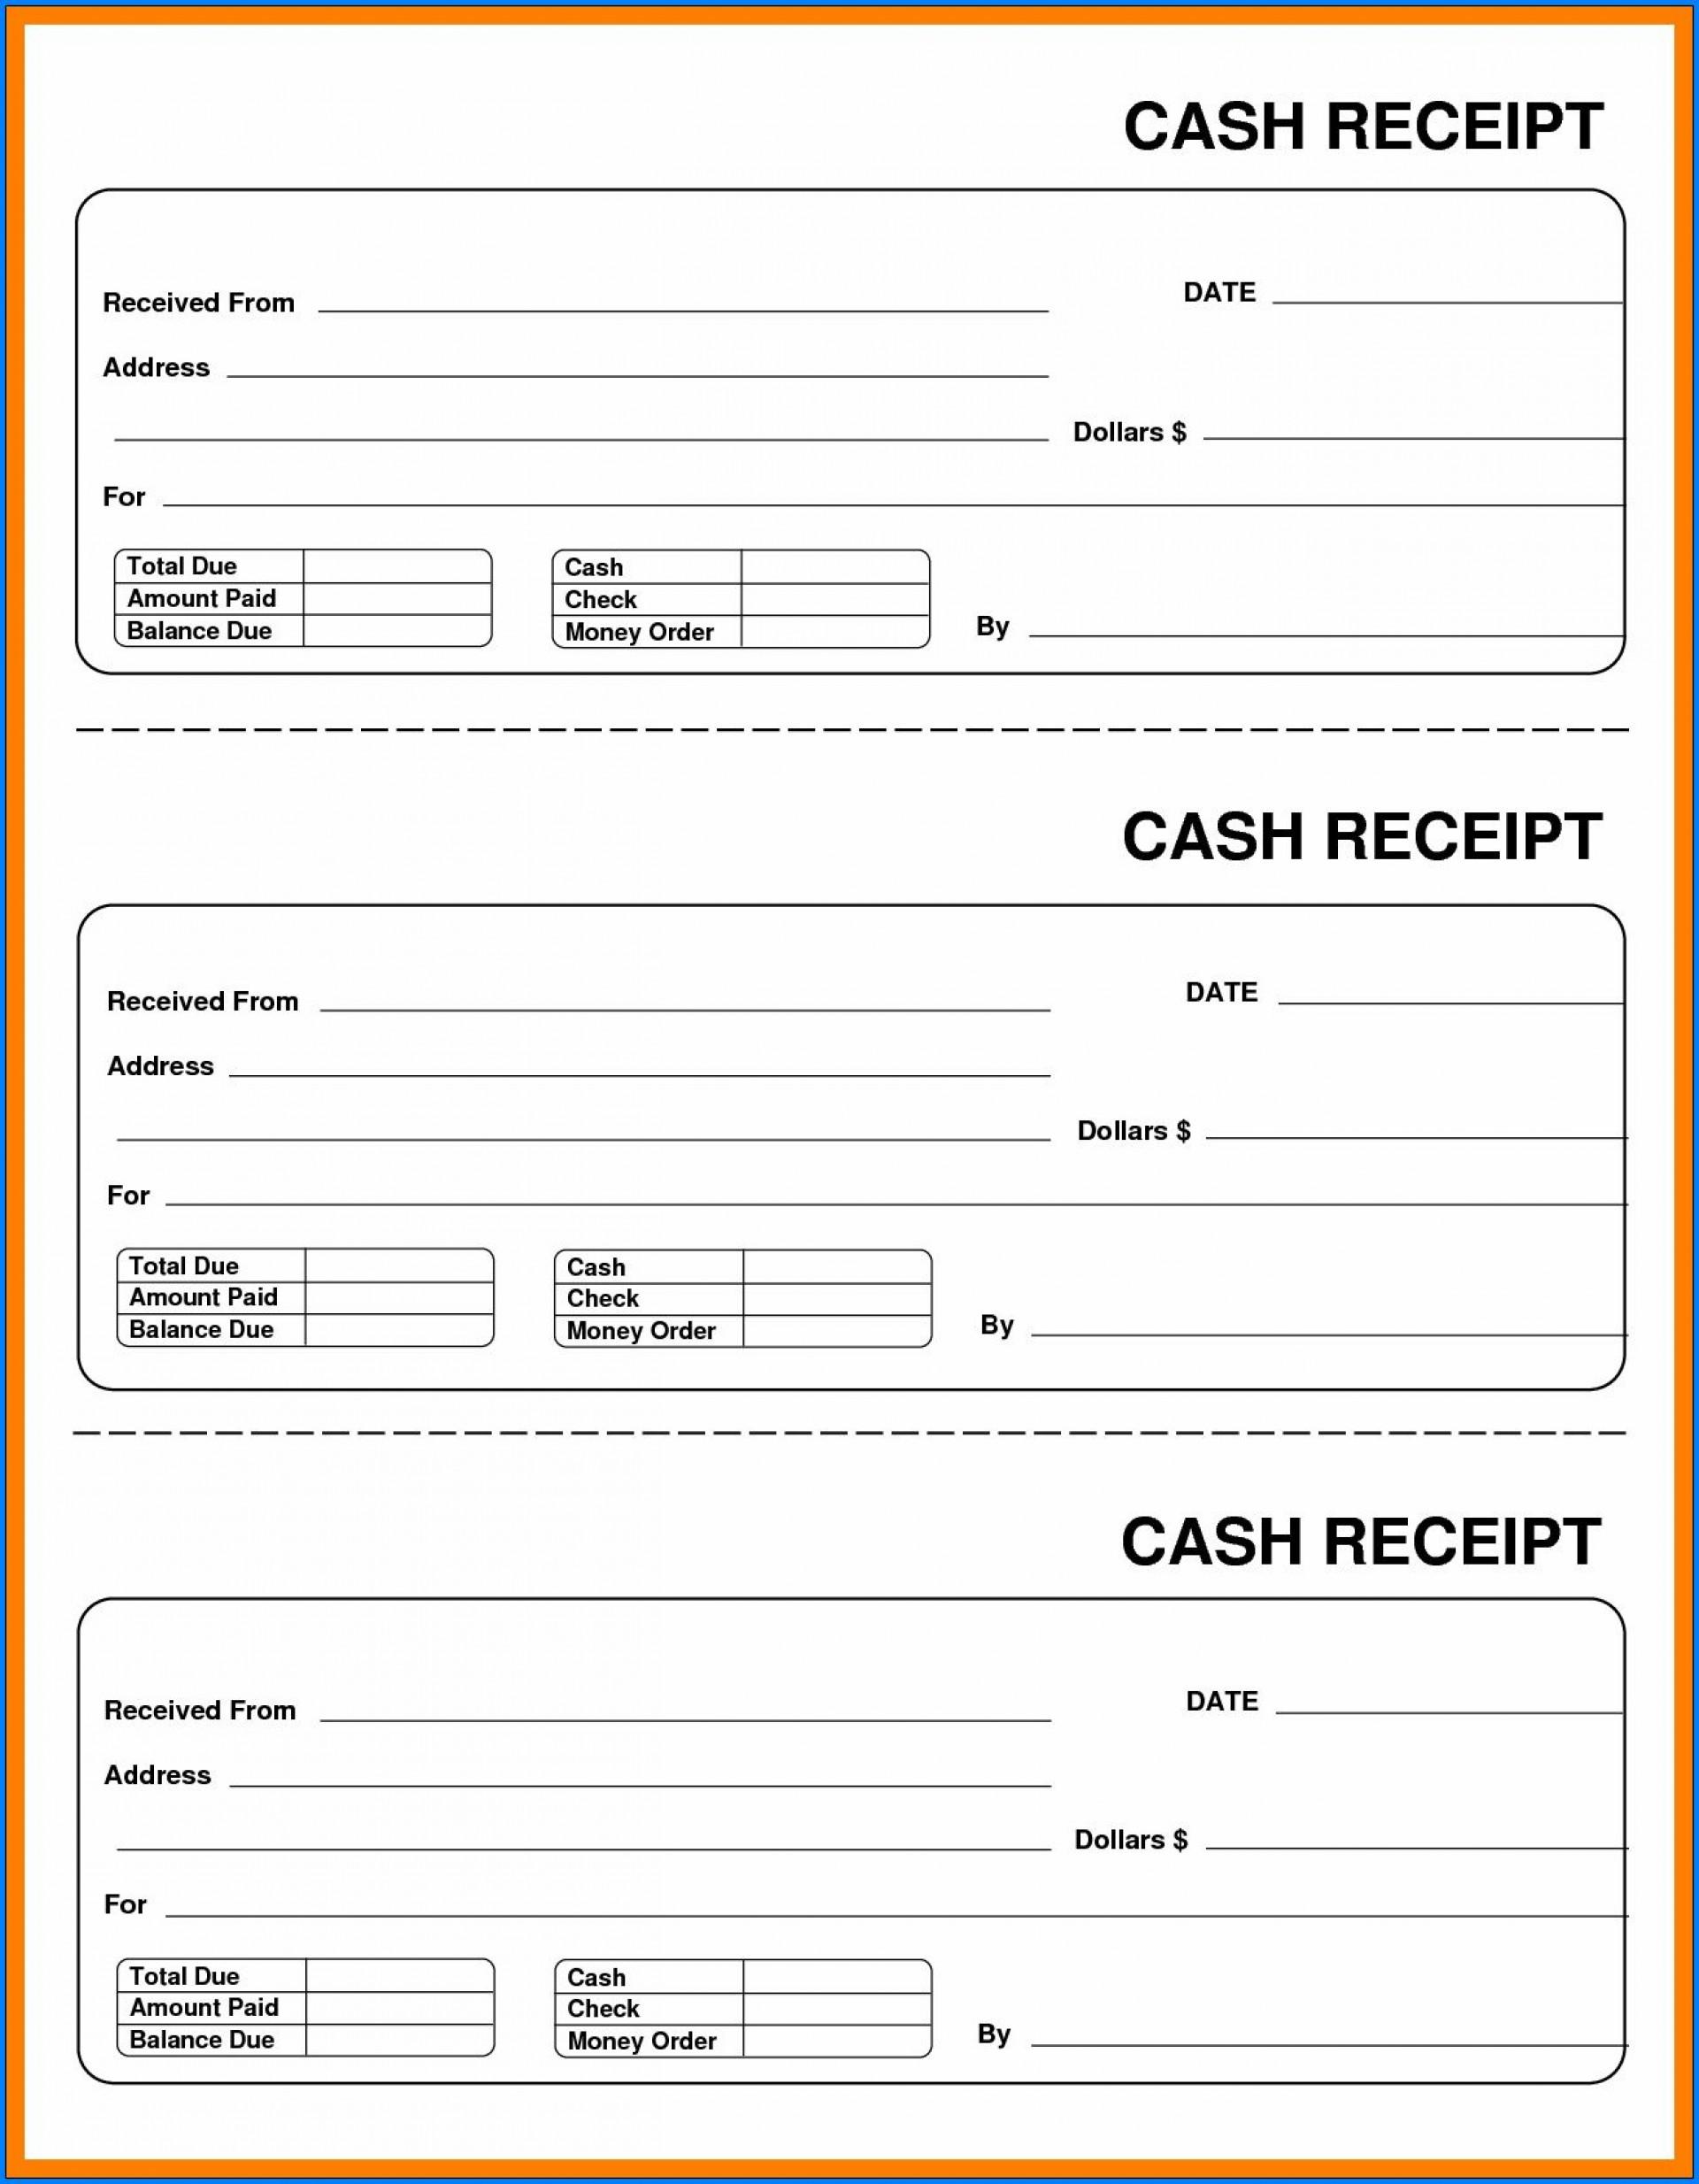 003 Formidable Free Printable Receipt Template Photo  Blank Cash Microsoft Word Uk1920